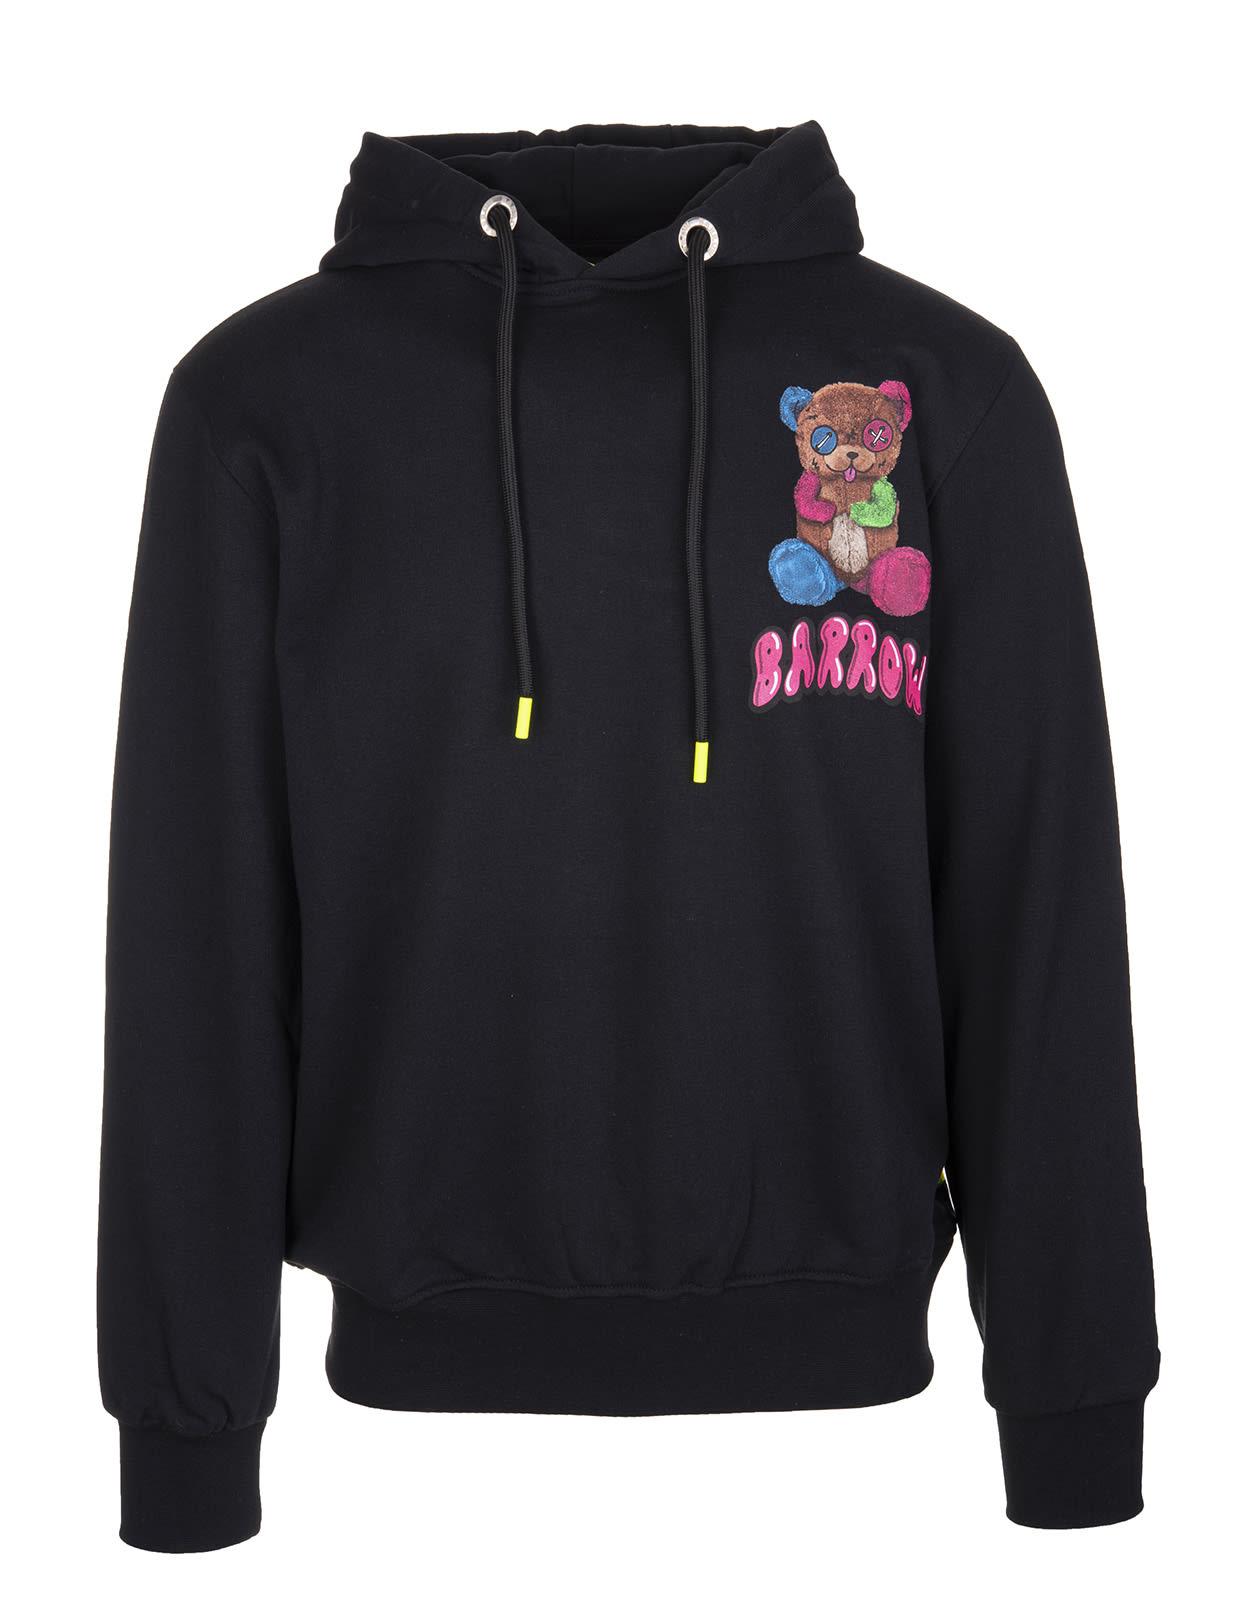 Barrow Black Hoodie With Multicolored Teddy Bear Print In Nero